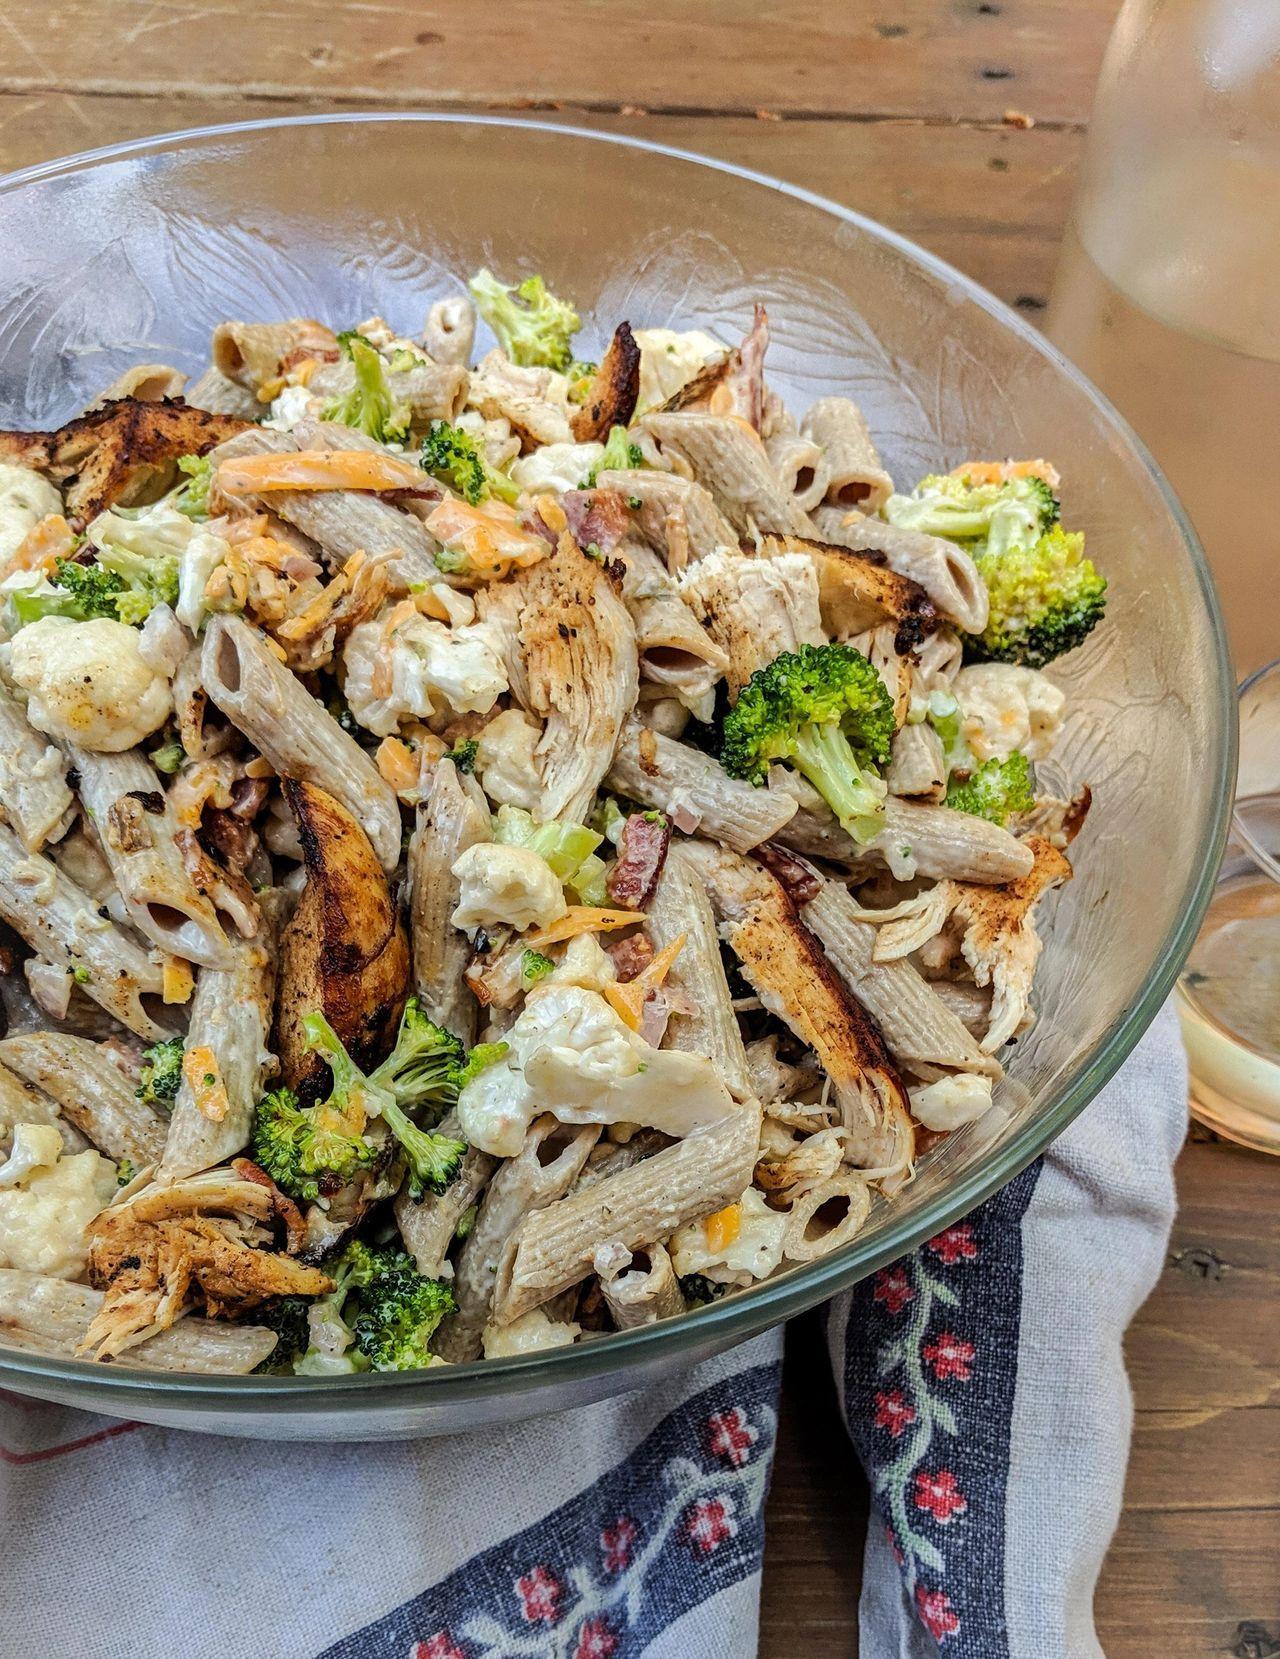 Salade de pâtes, brocoli, chou-fleur, poulet & bacon ...